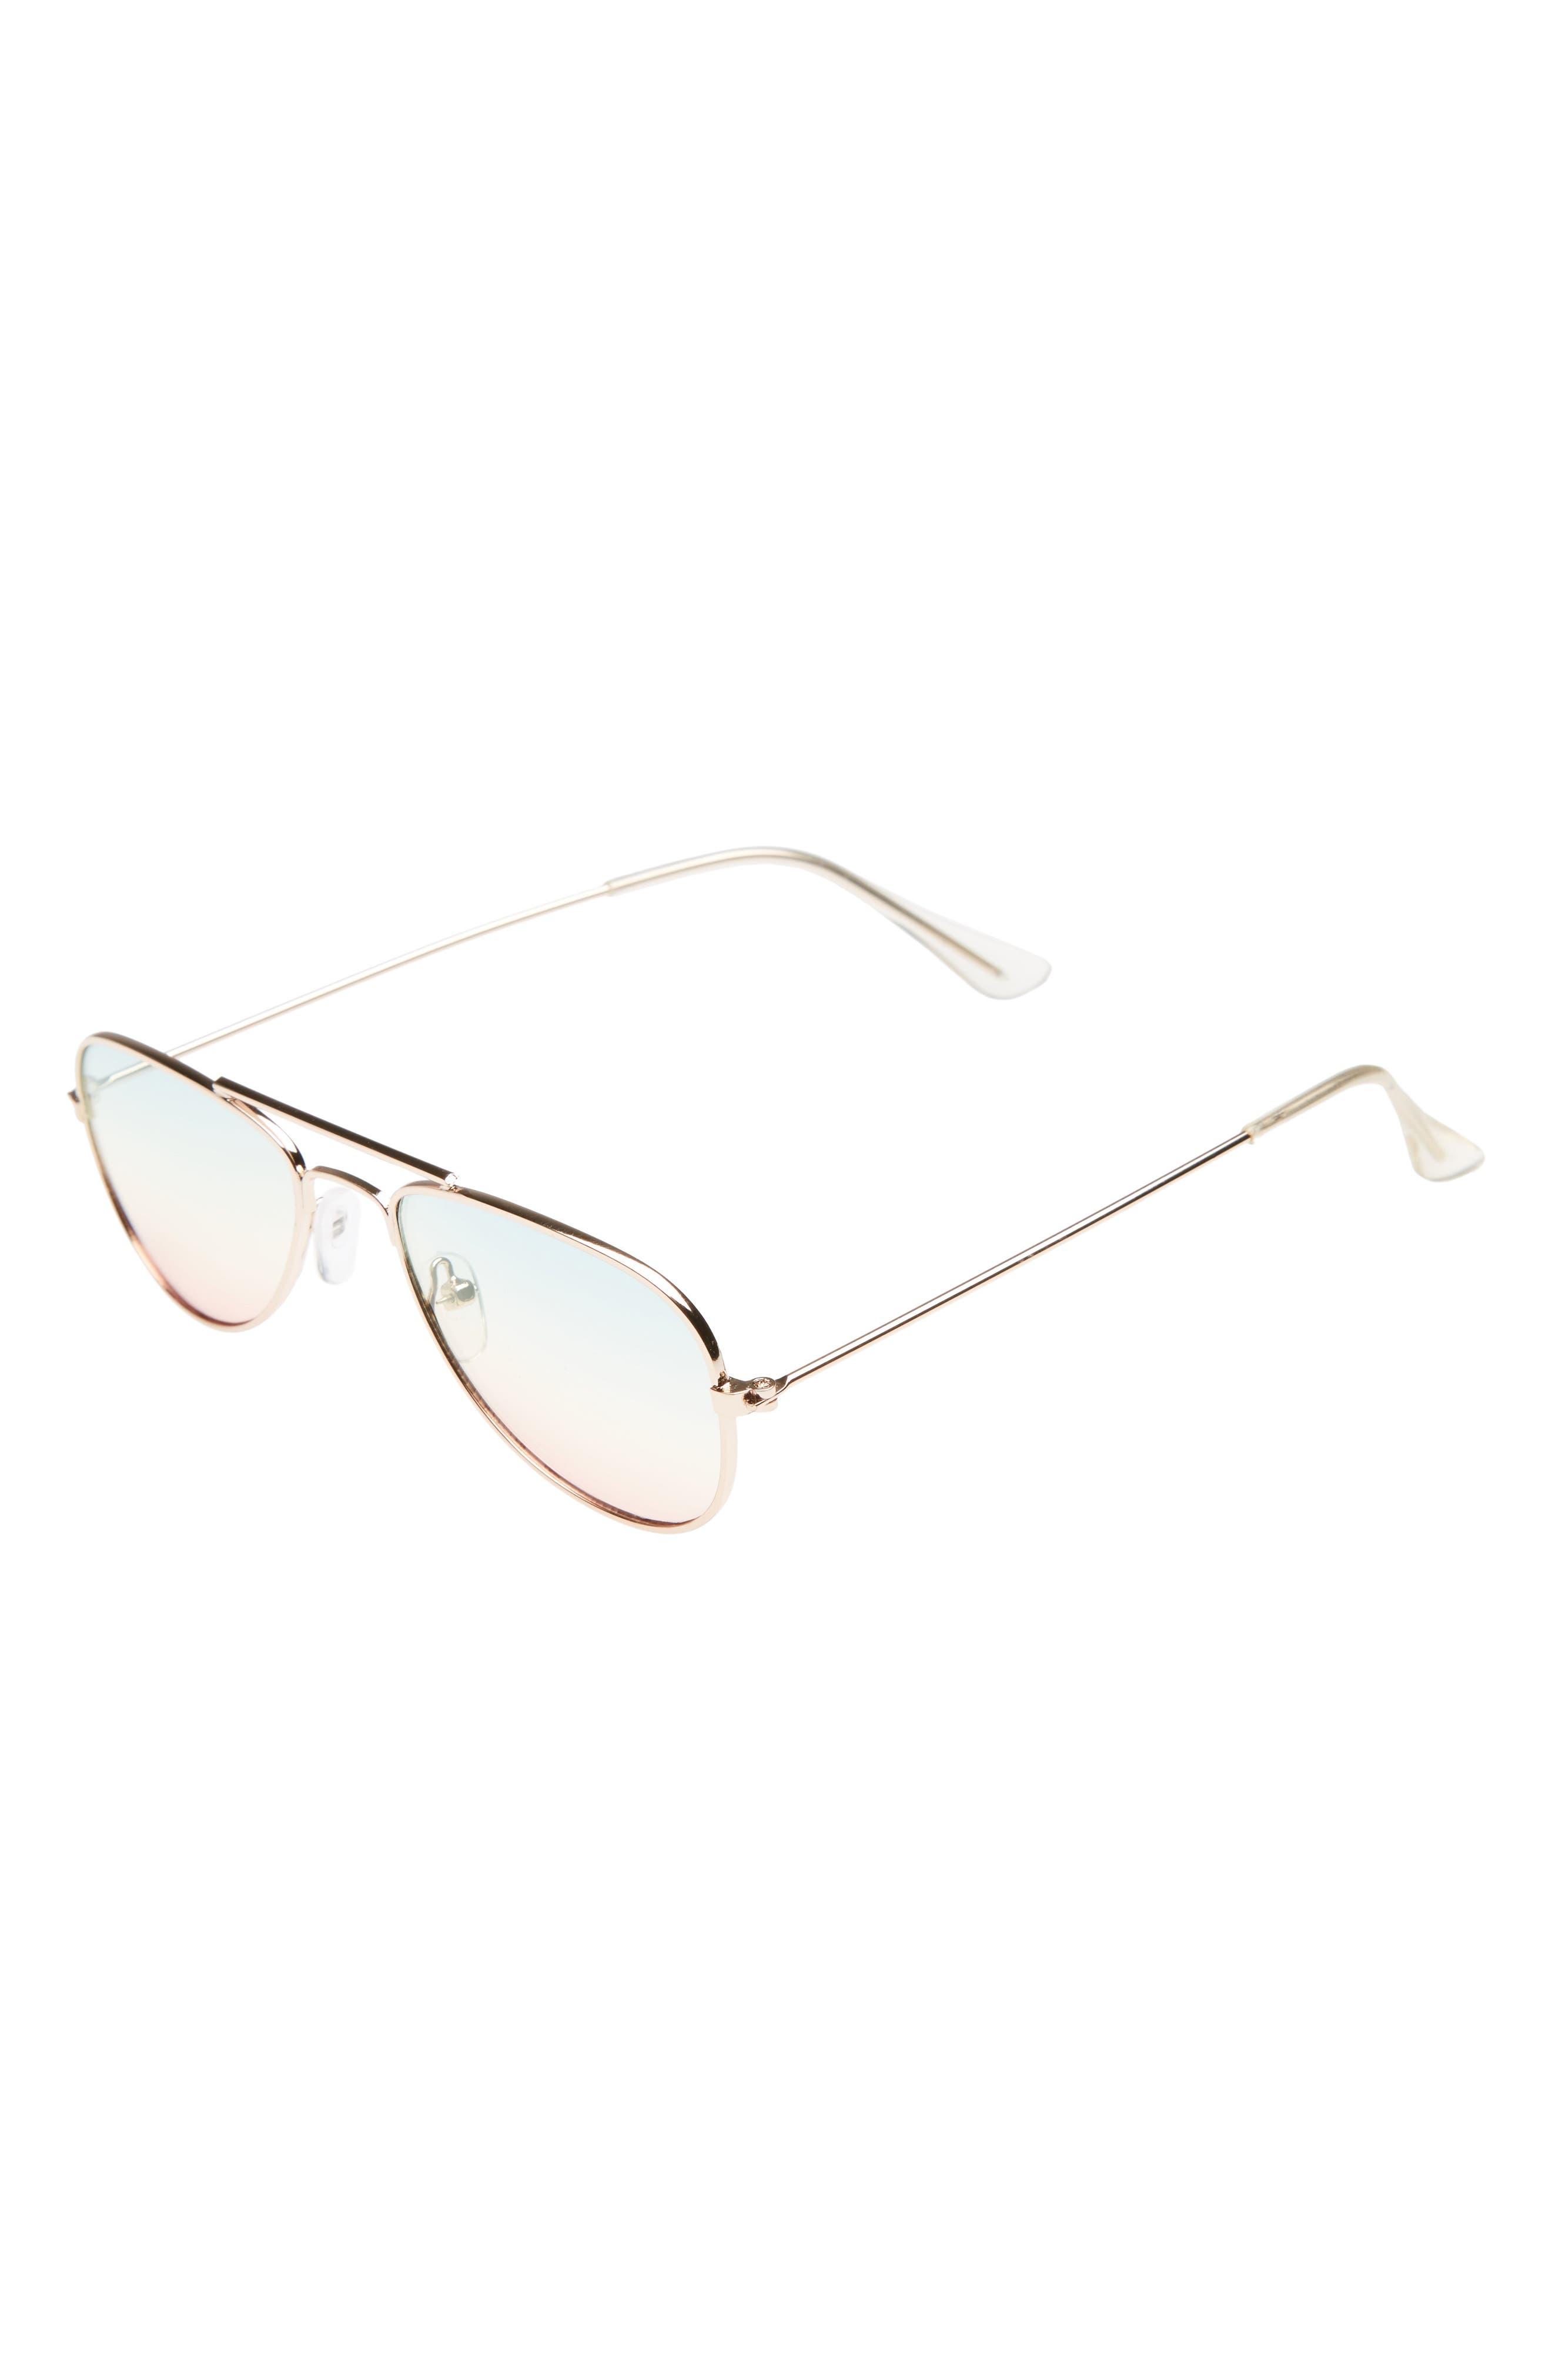 Rainbow Aviator Sunglasses,                         Main,                         color, 710